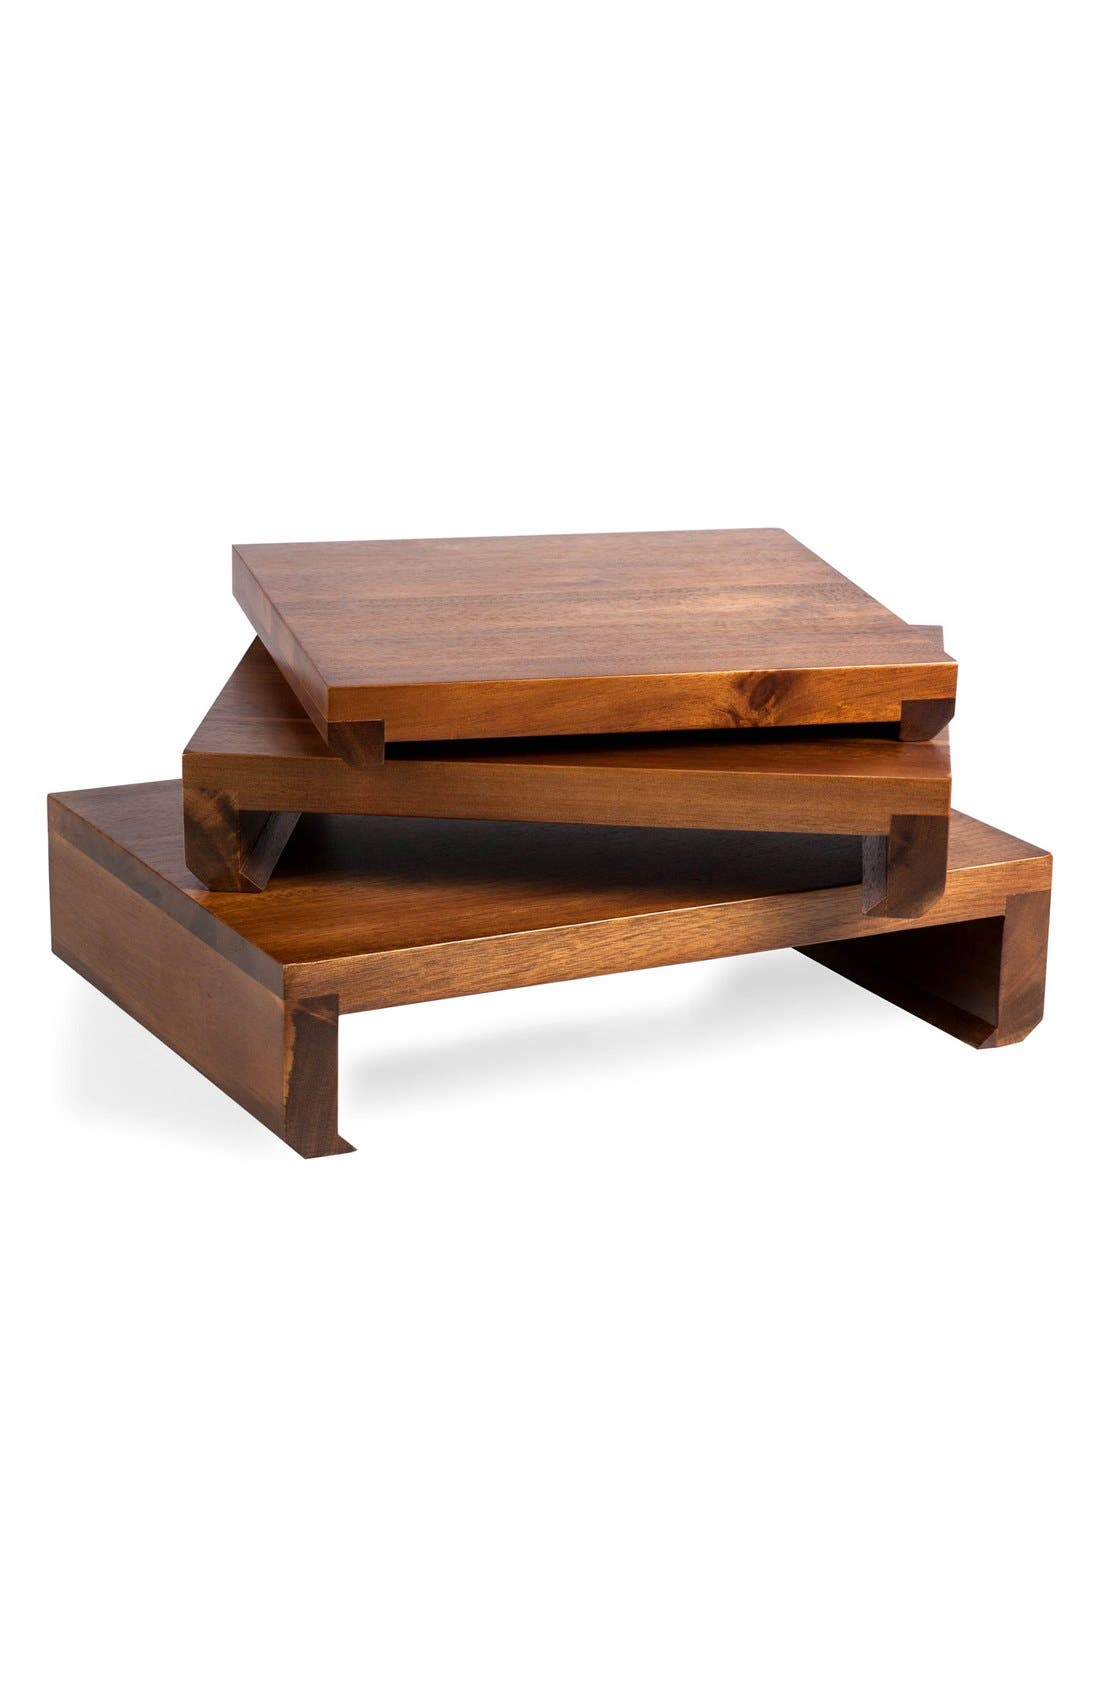 Picnic Time 'Etage' Wood Serving Pedestals